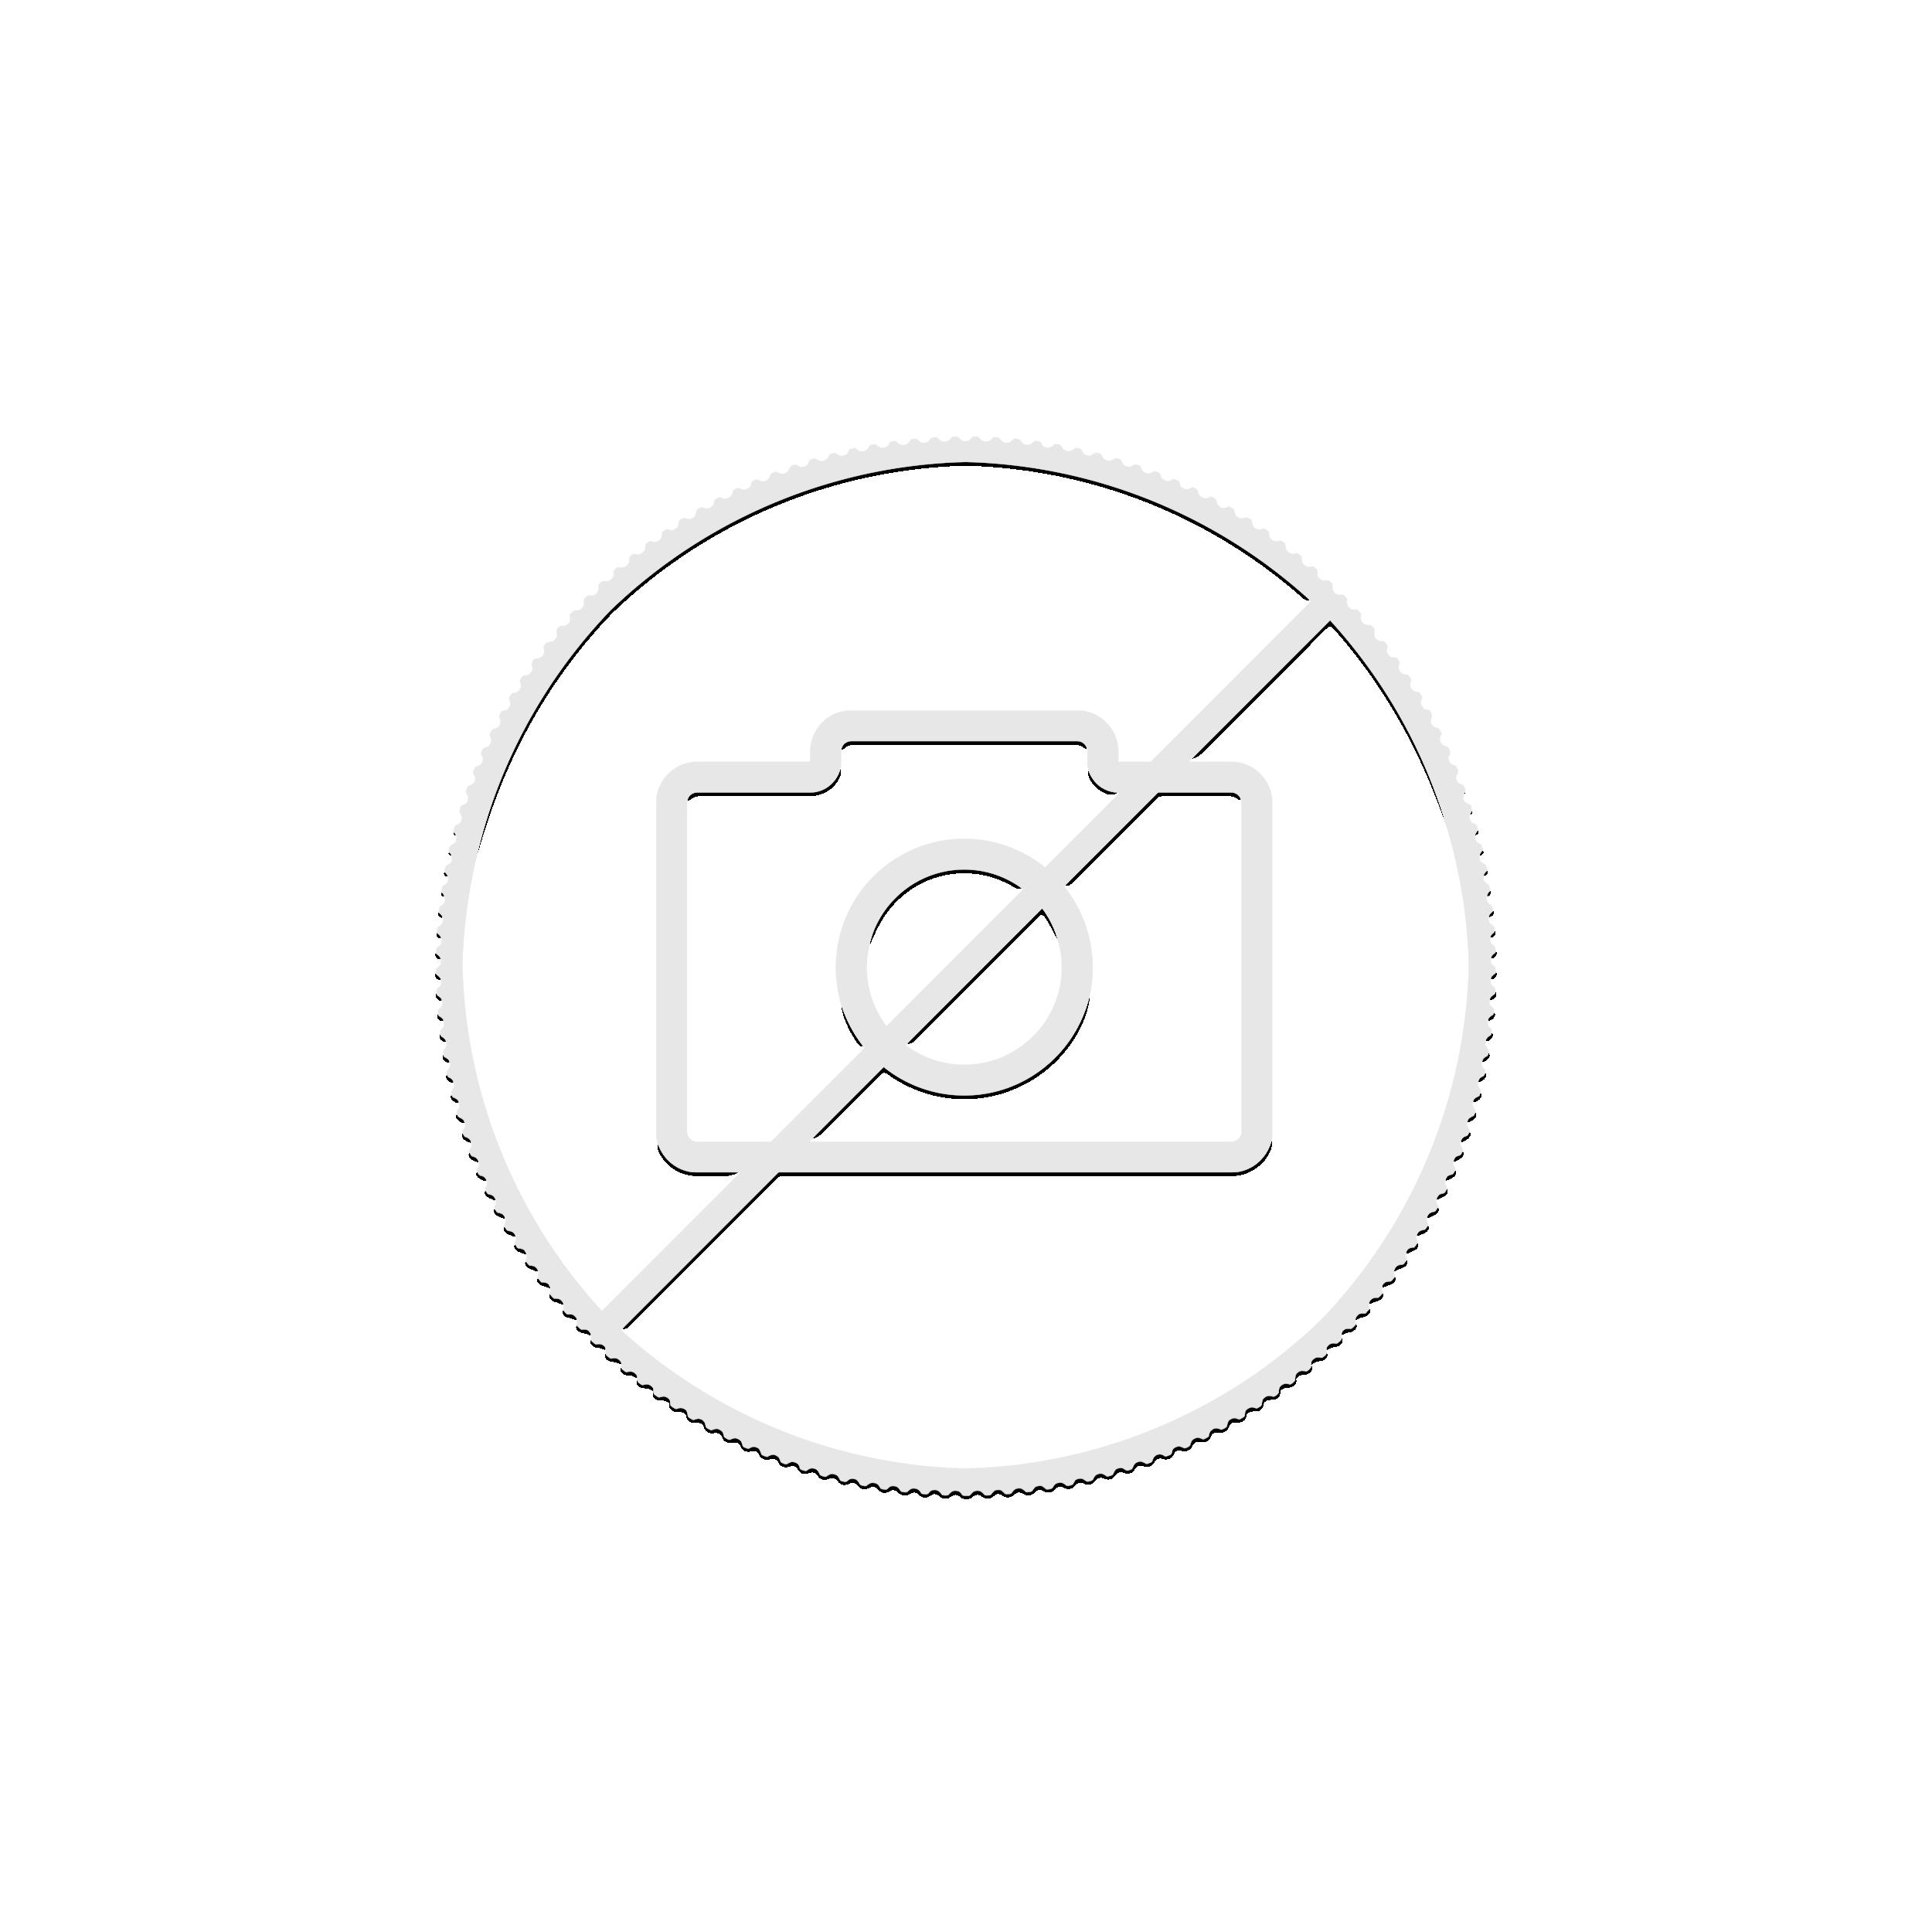 1 Troy ounce silver Kangaroo coin 2021